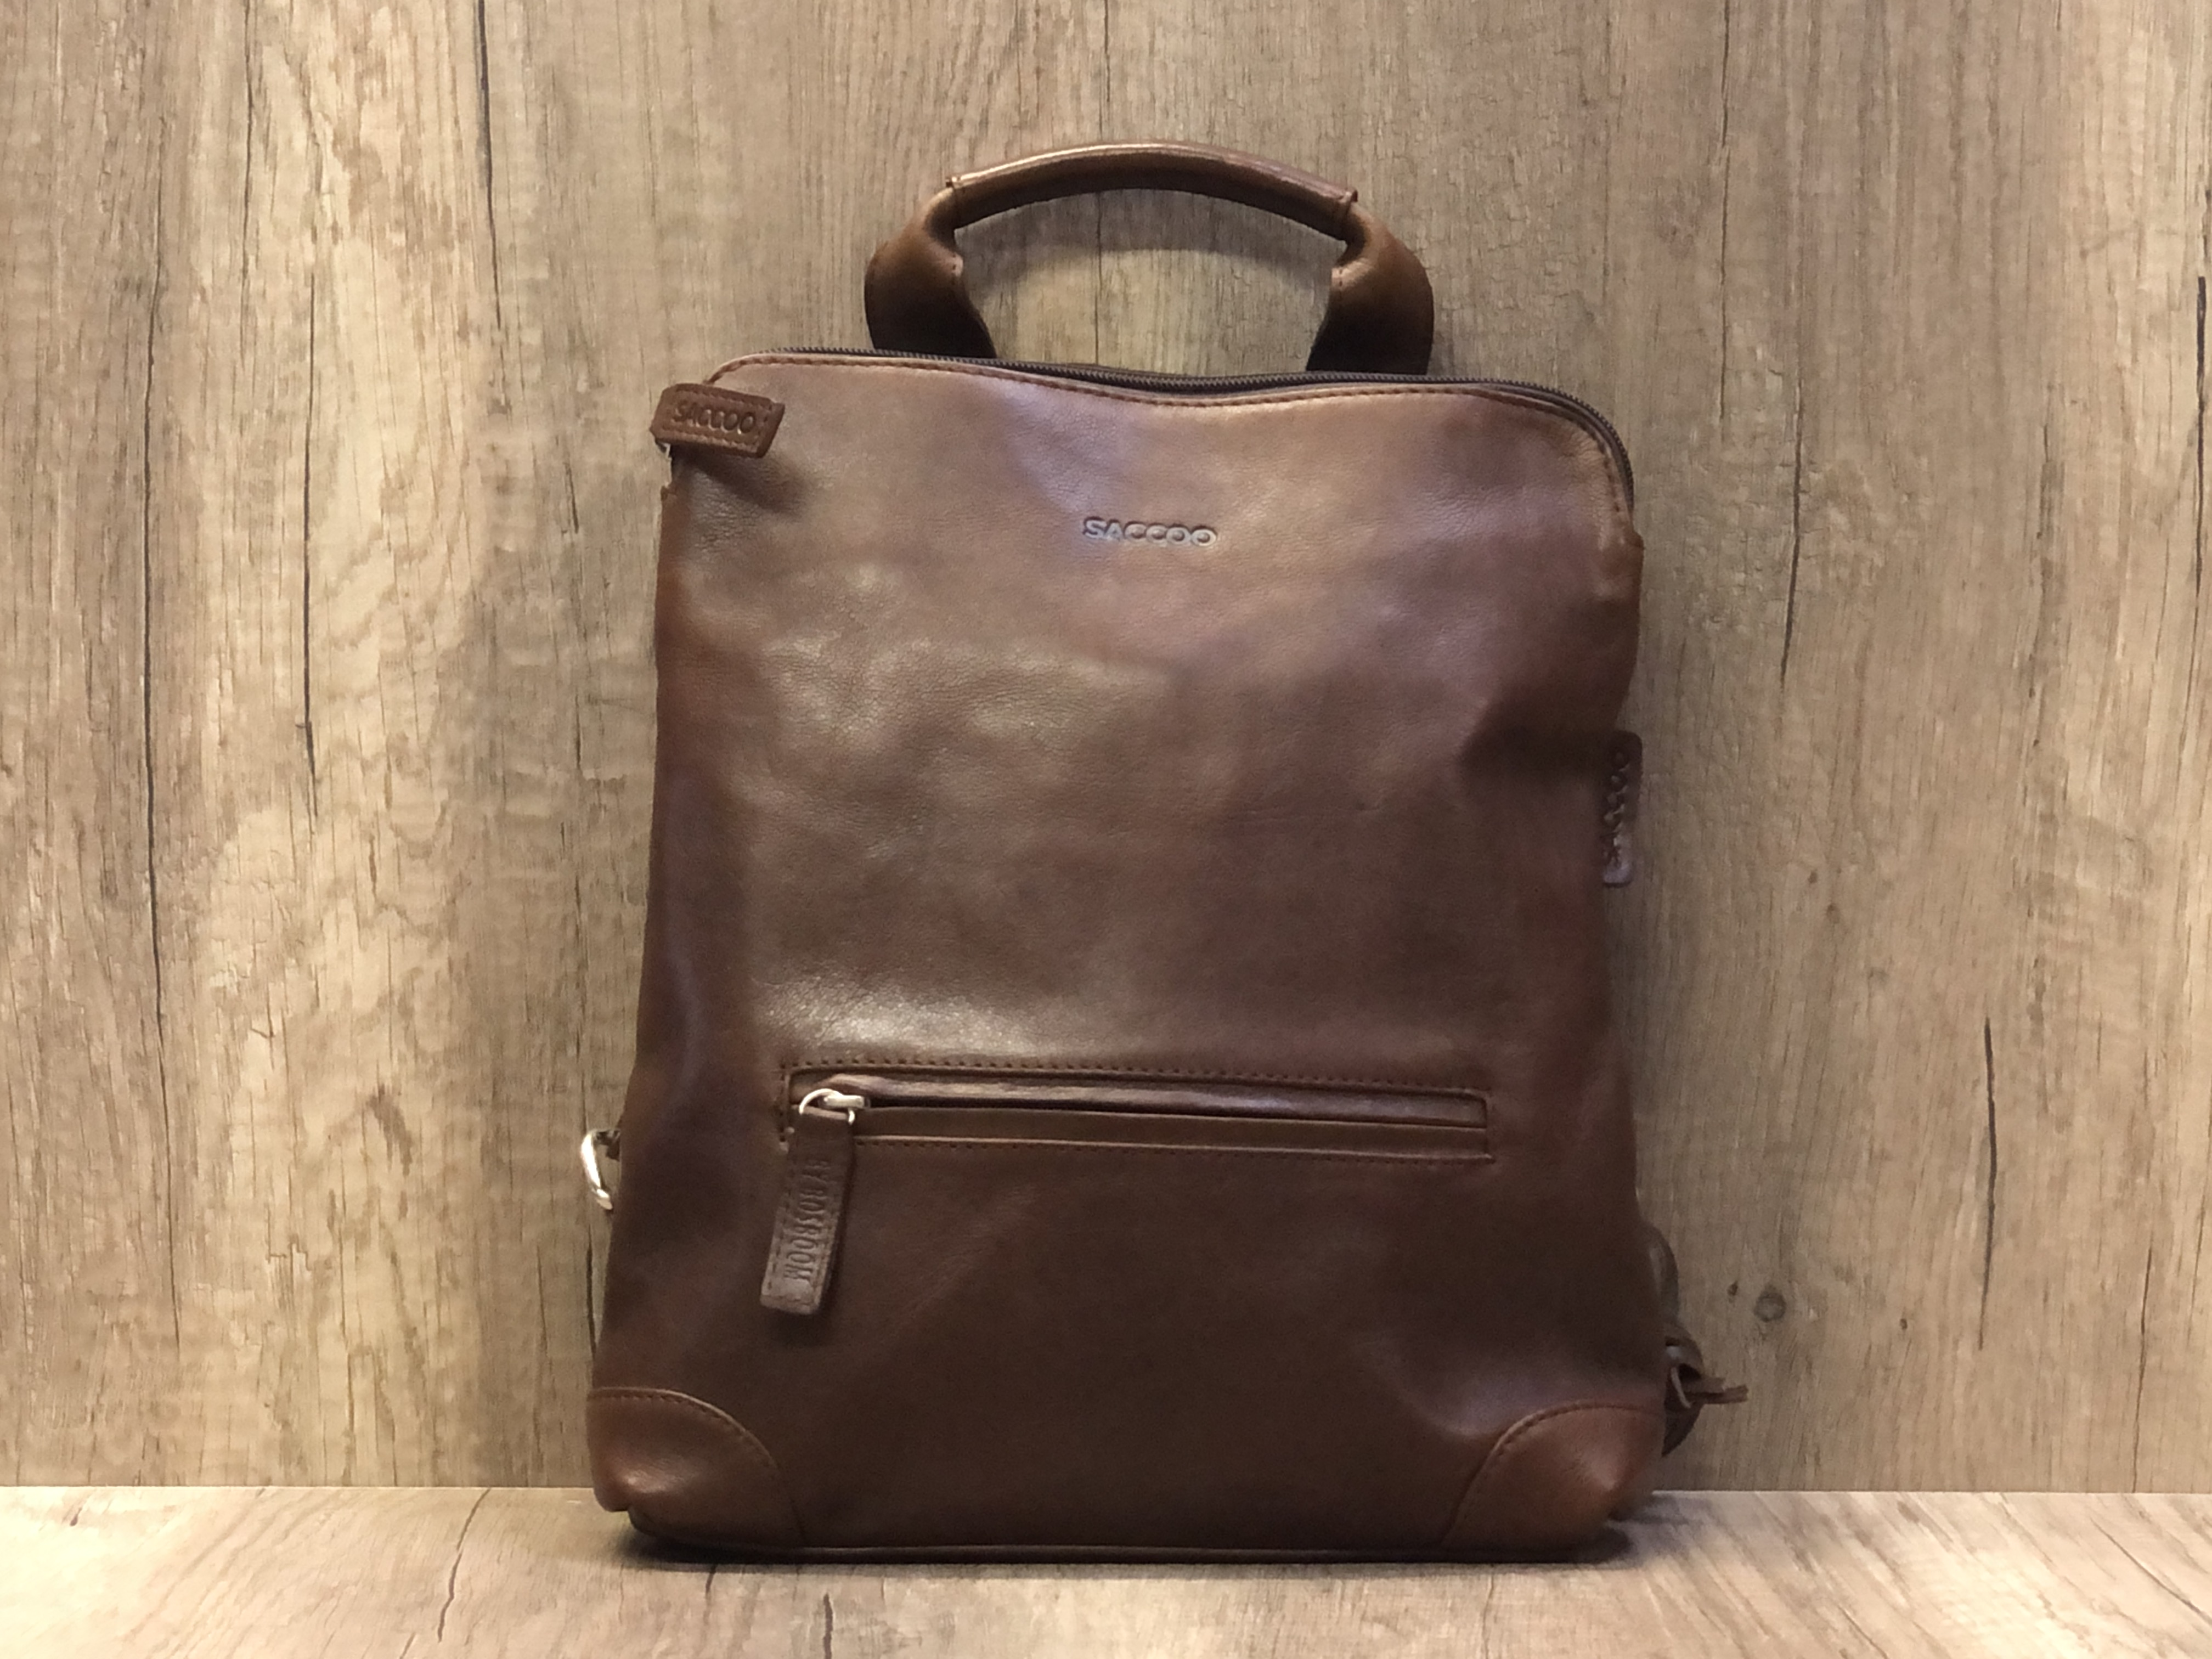 Saccoo-handtassen 15